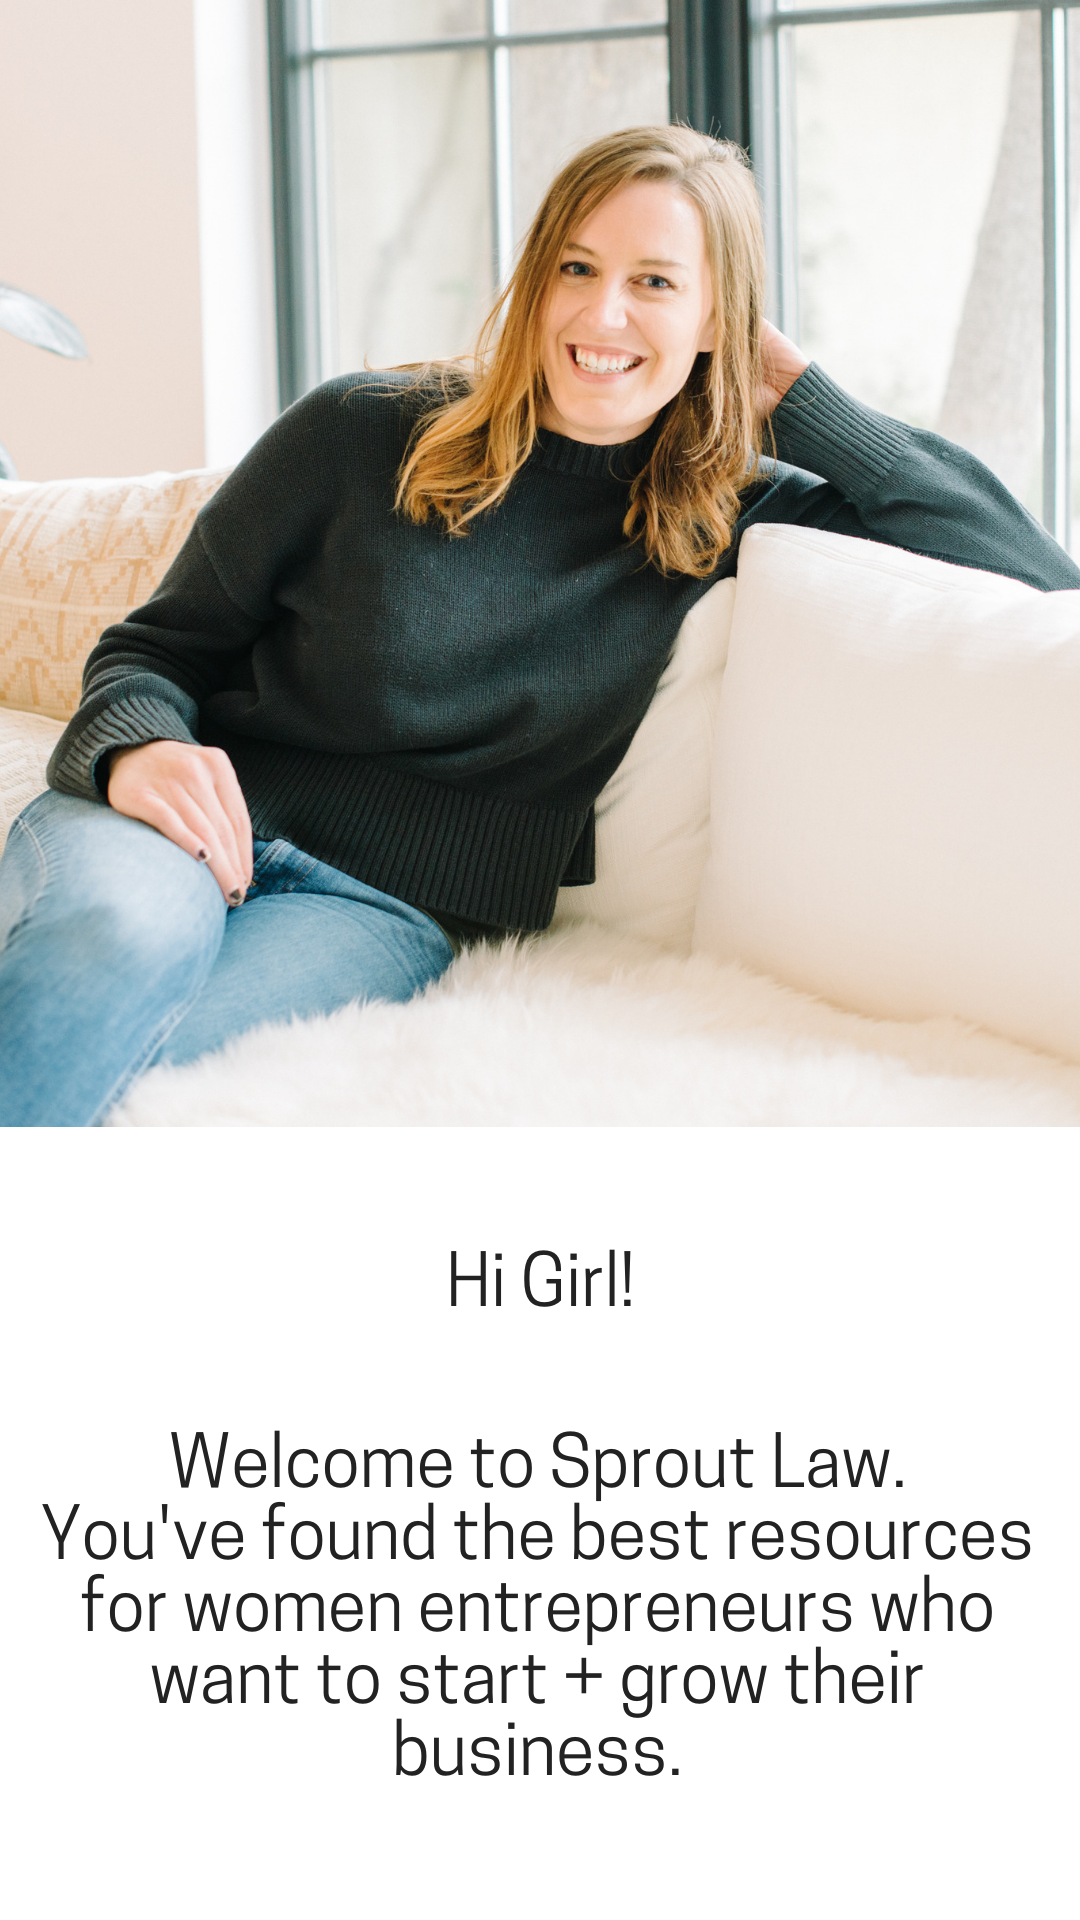 Nicole Swartz, Sprout Law